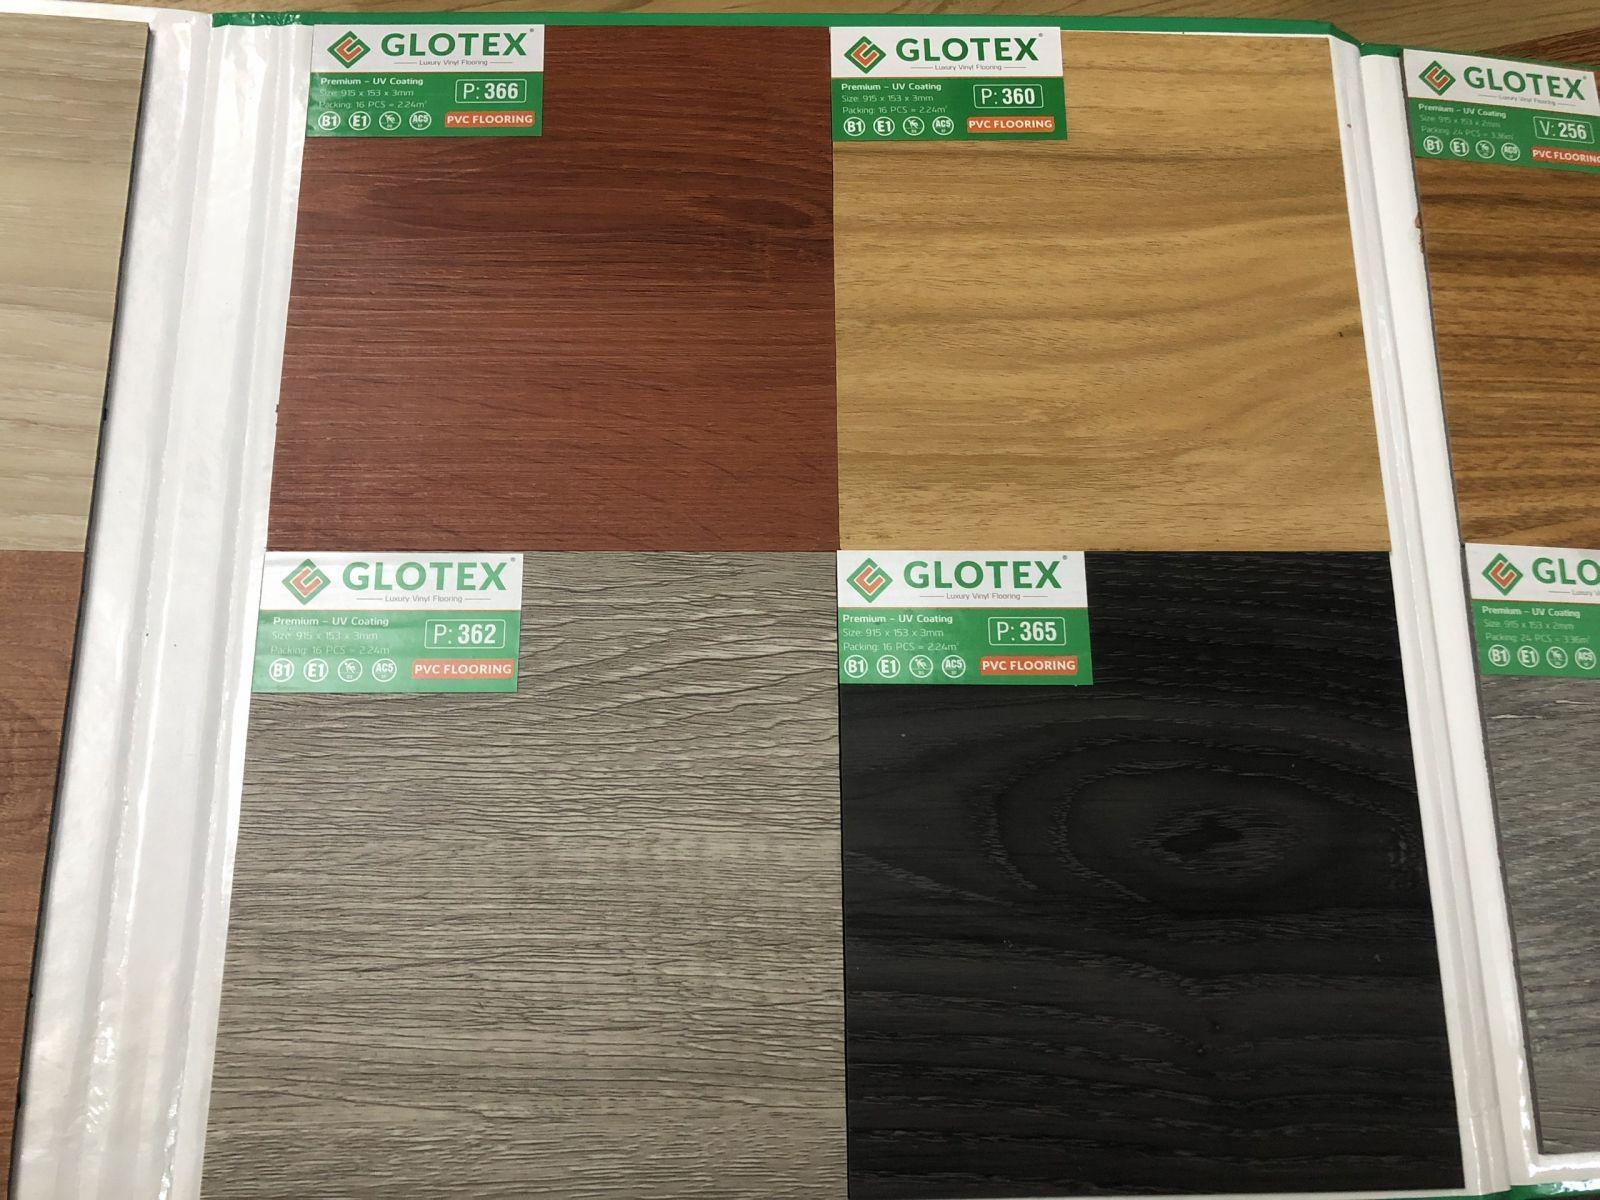 sàn nhựa Glotex giả gỗ